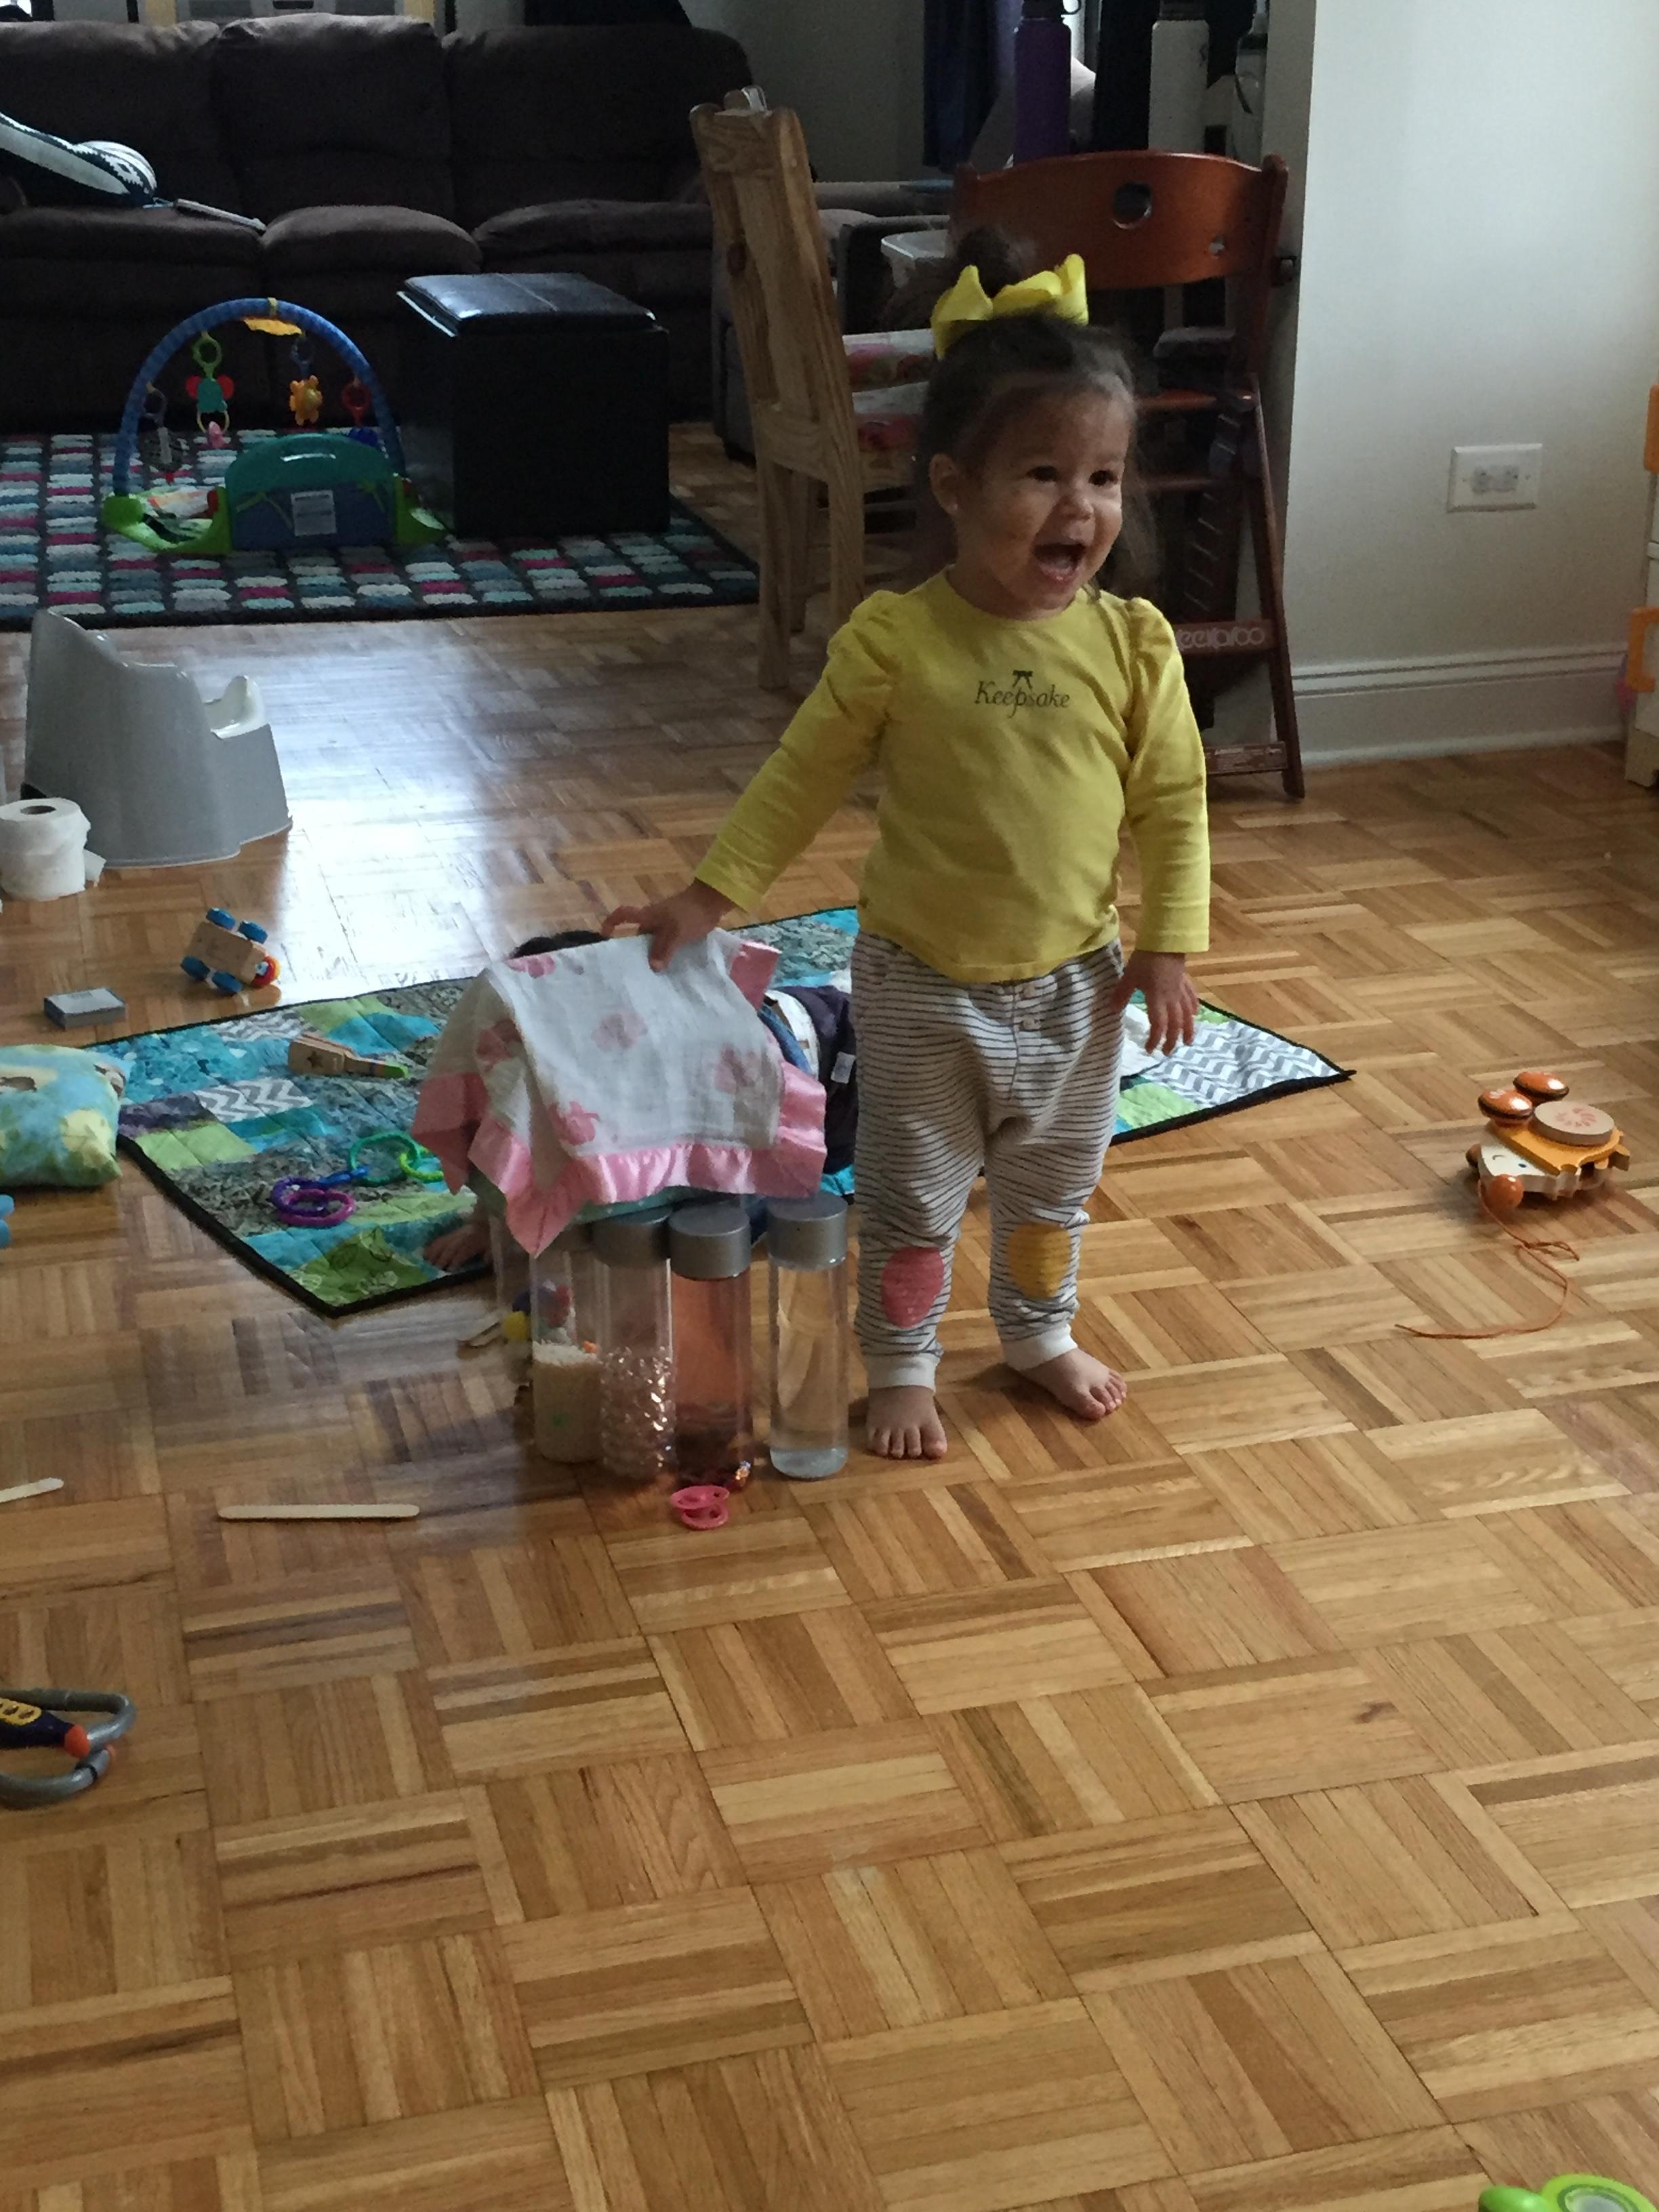 She made a mini fort!